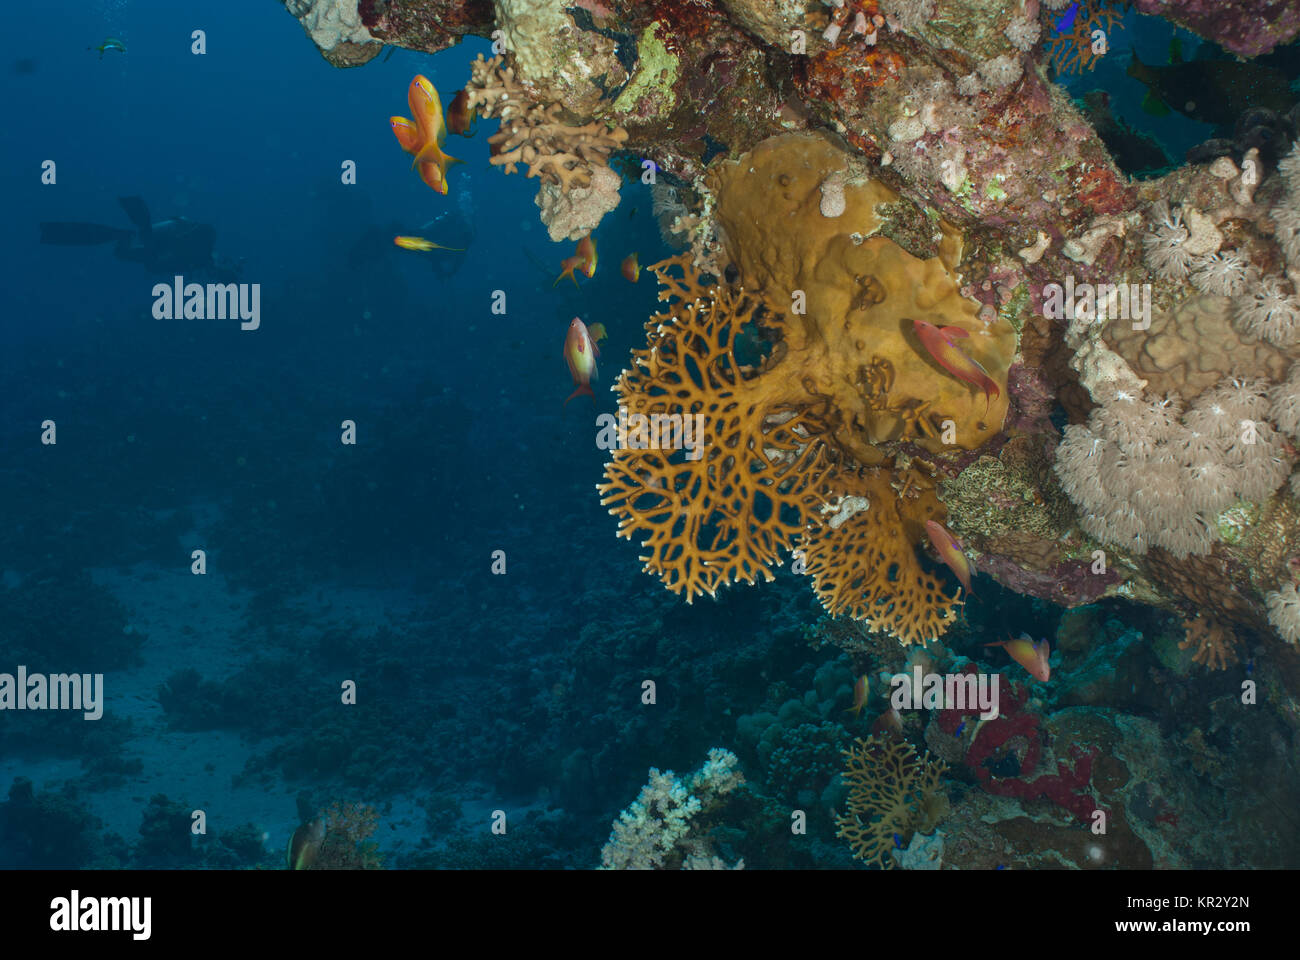 Fire Coral, Millepora dichotoma, Milleporidae, Sharm El-Sheik, Red Sea, Egypt - Stock Image